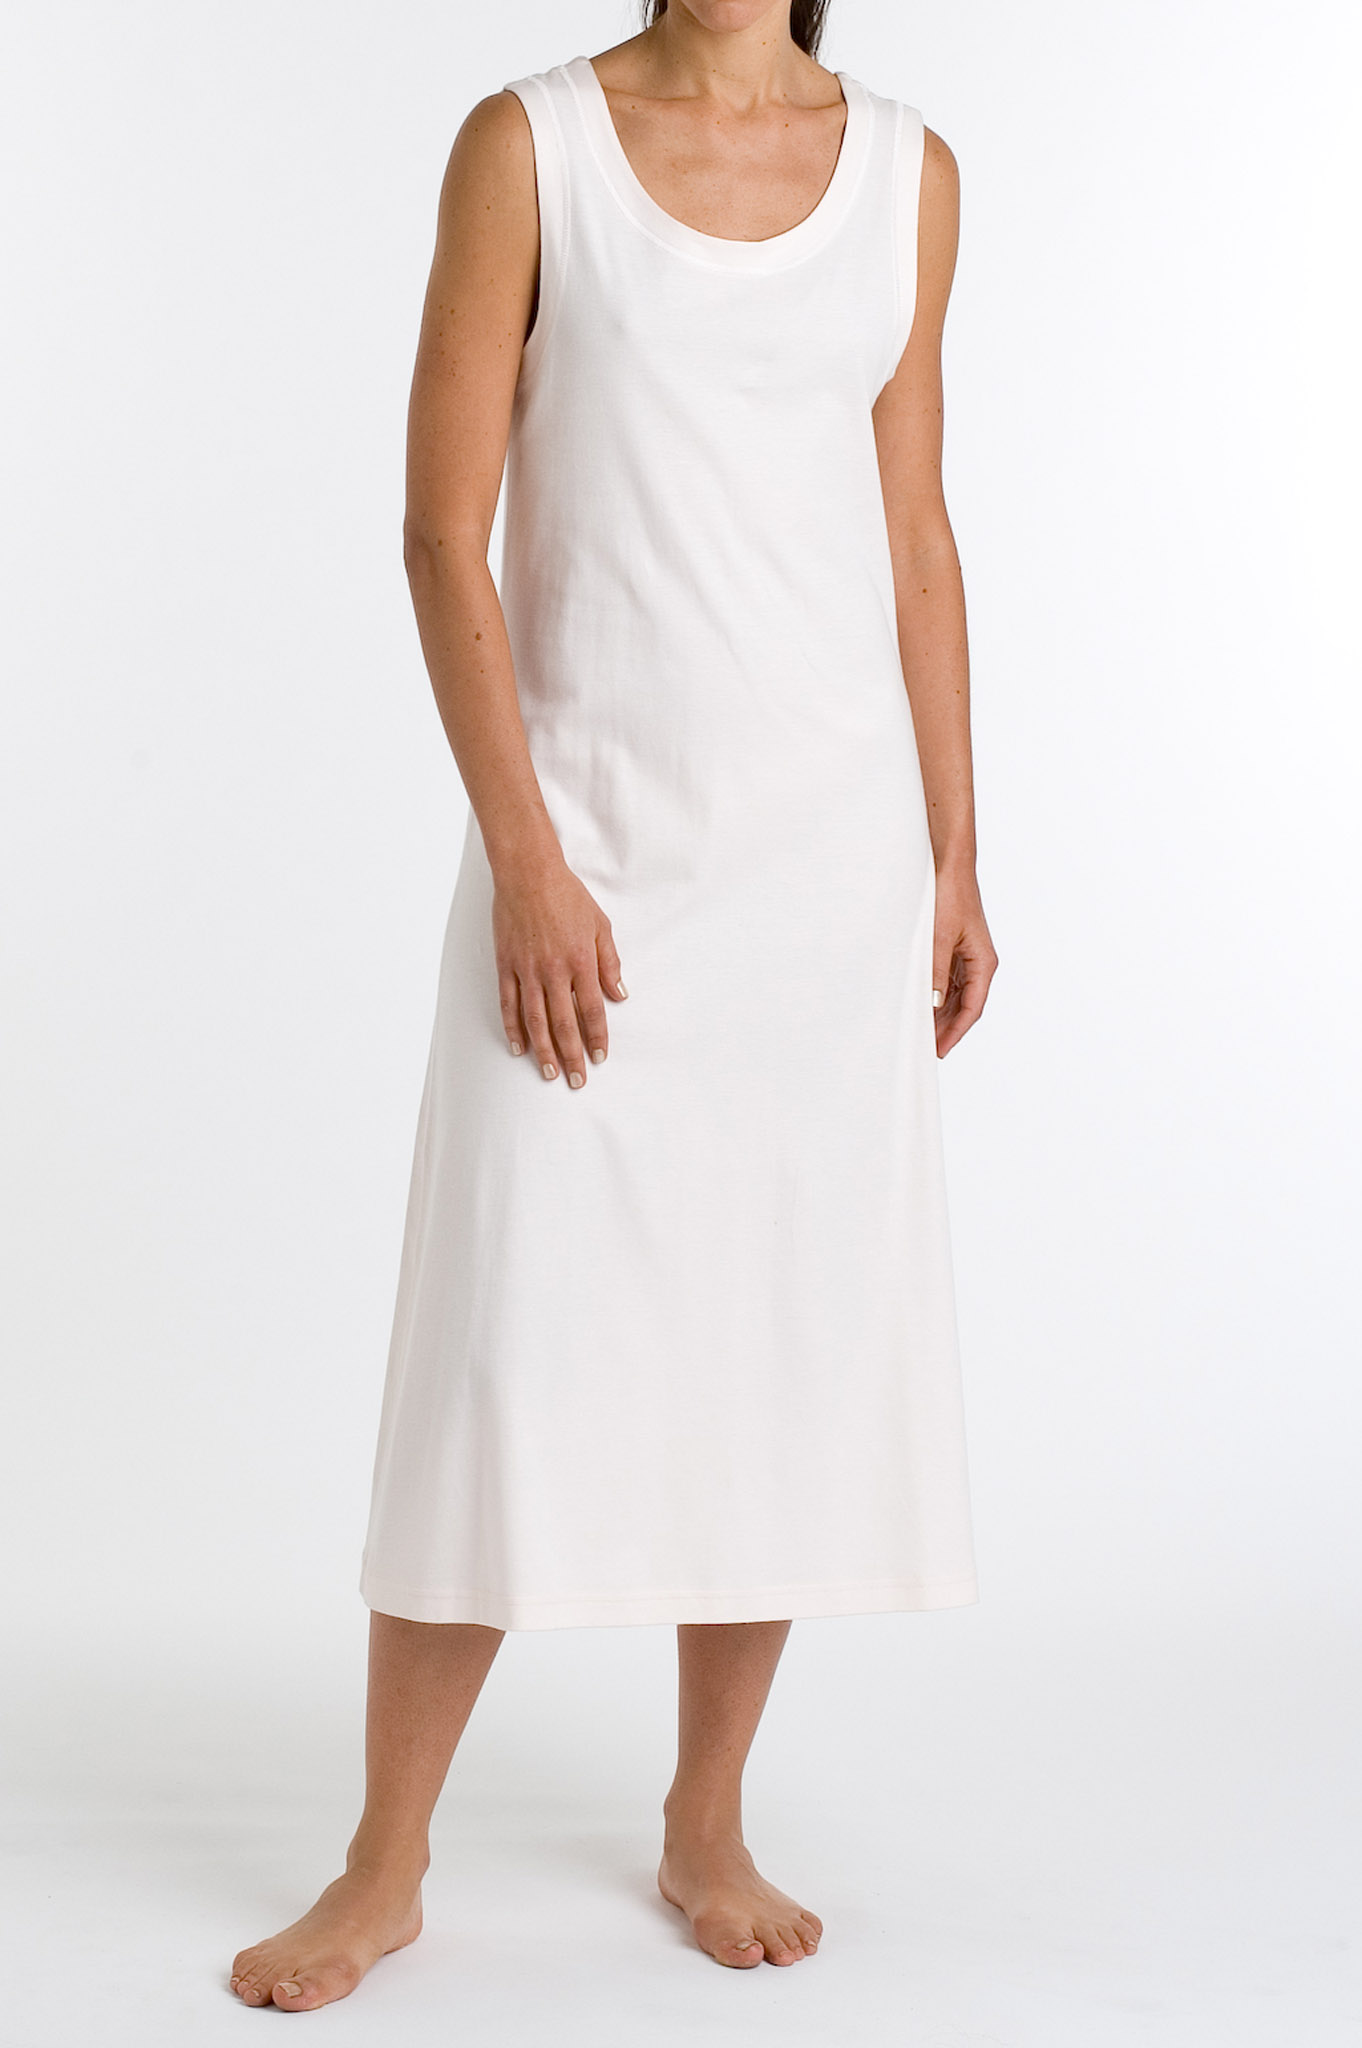 P. Jamas P.Jamas Butterknit Sleeveless Long Gown White - ...